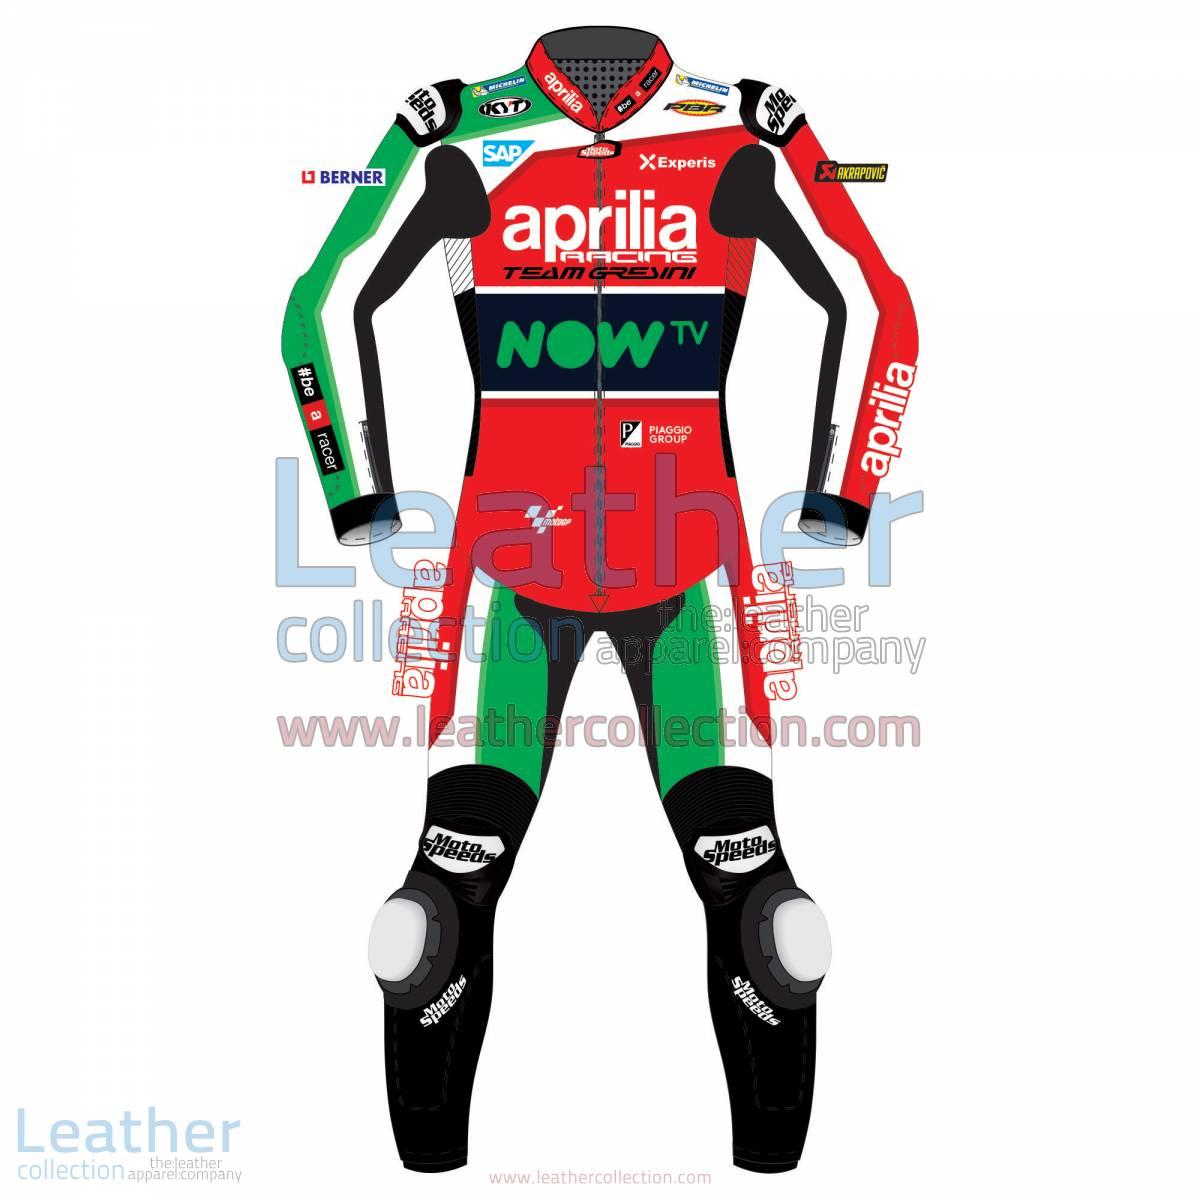 Aleix Espargaro Aprilia 2017 MotoGP Race Suit | Aleix Espargaro Aprilia 2017 MotoGP Race Suit